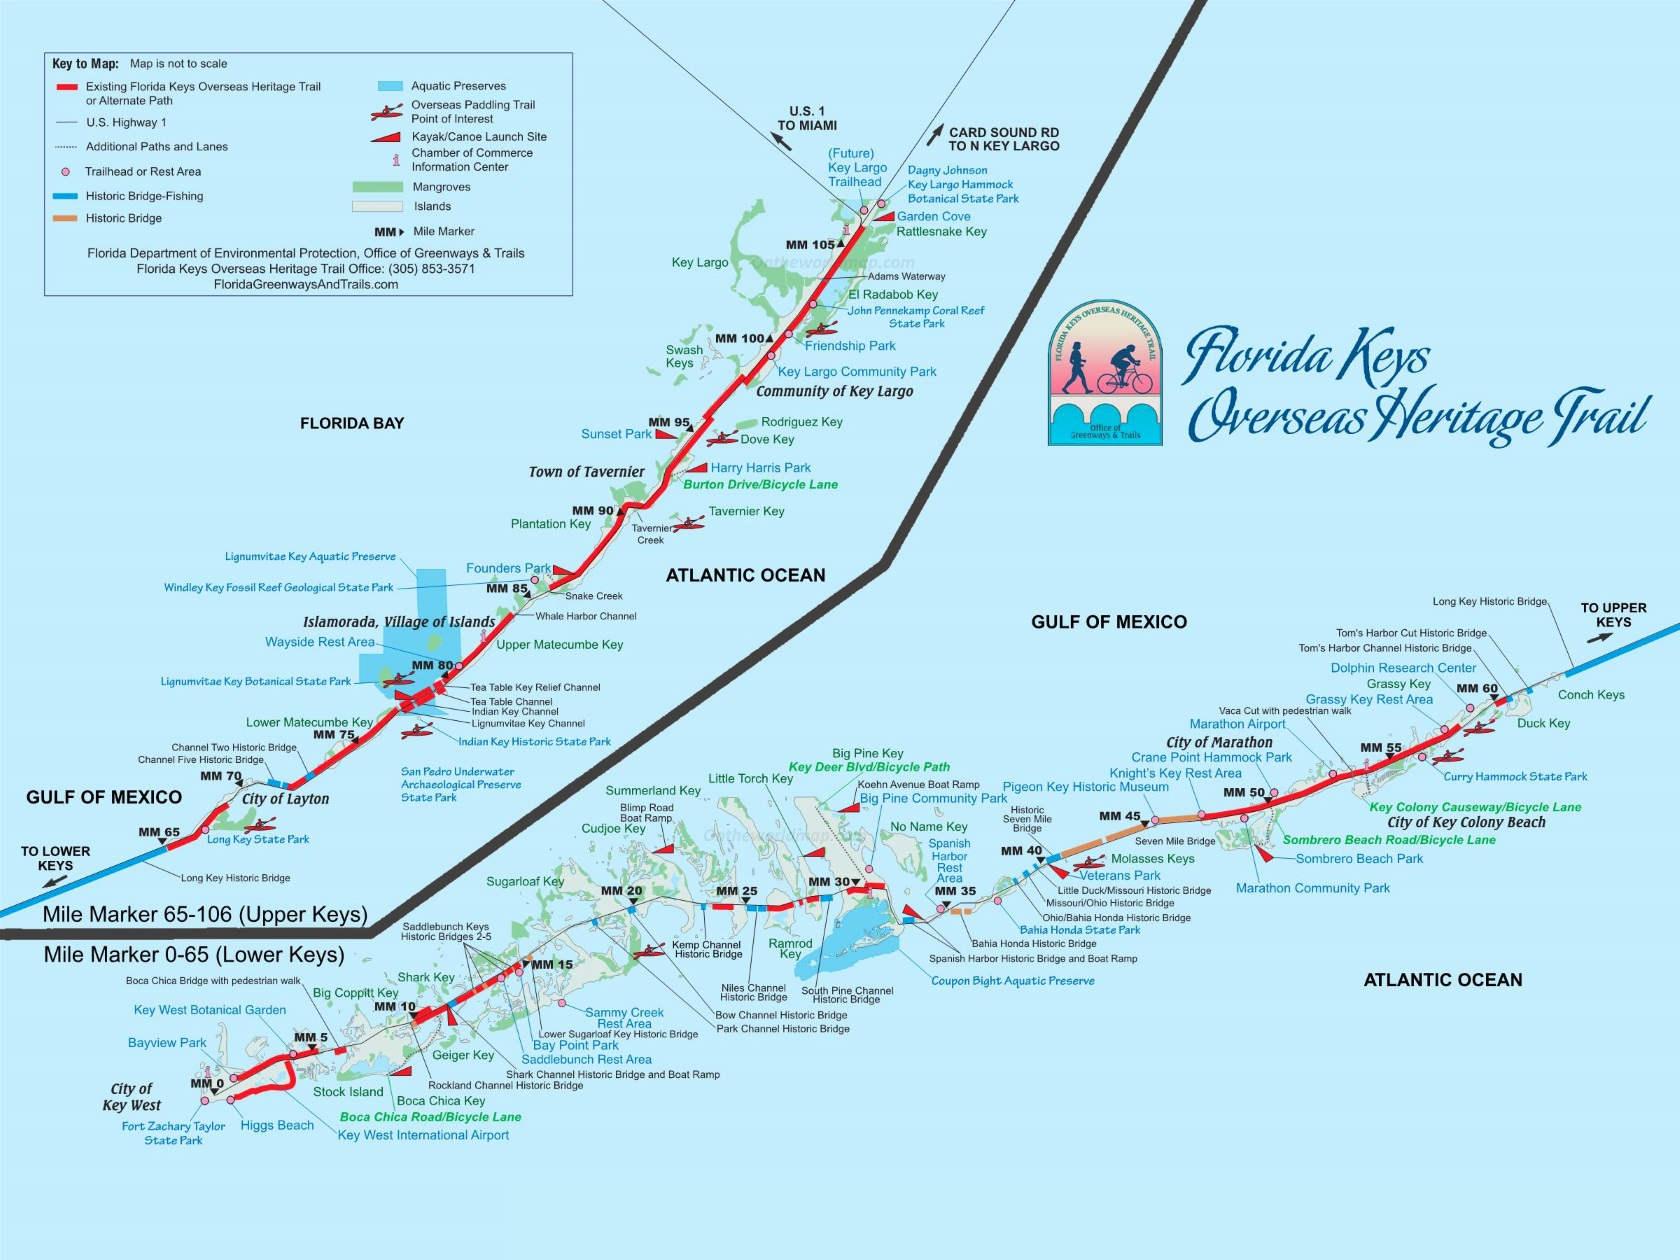 Florida Keys Overseas Heritage Bike Trail Map Florida Keys Overseas Heritage Trail Map